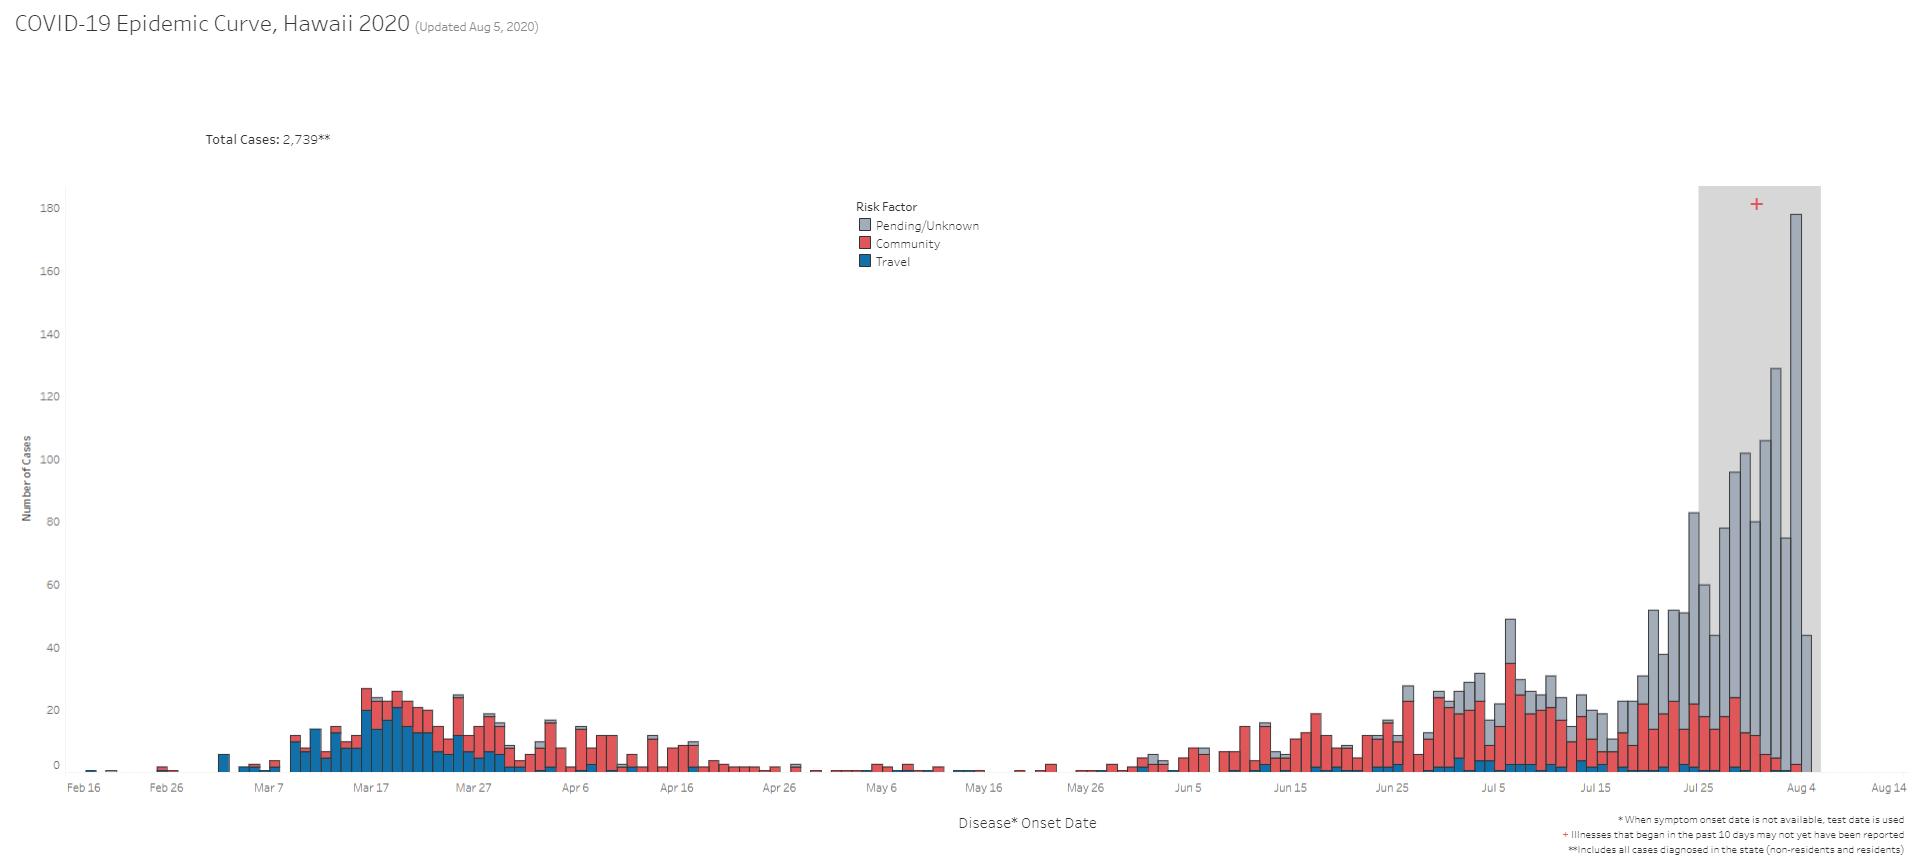 COVID-19 Epidemic Curve Hawaii August 6, 2020